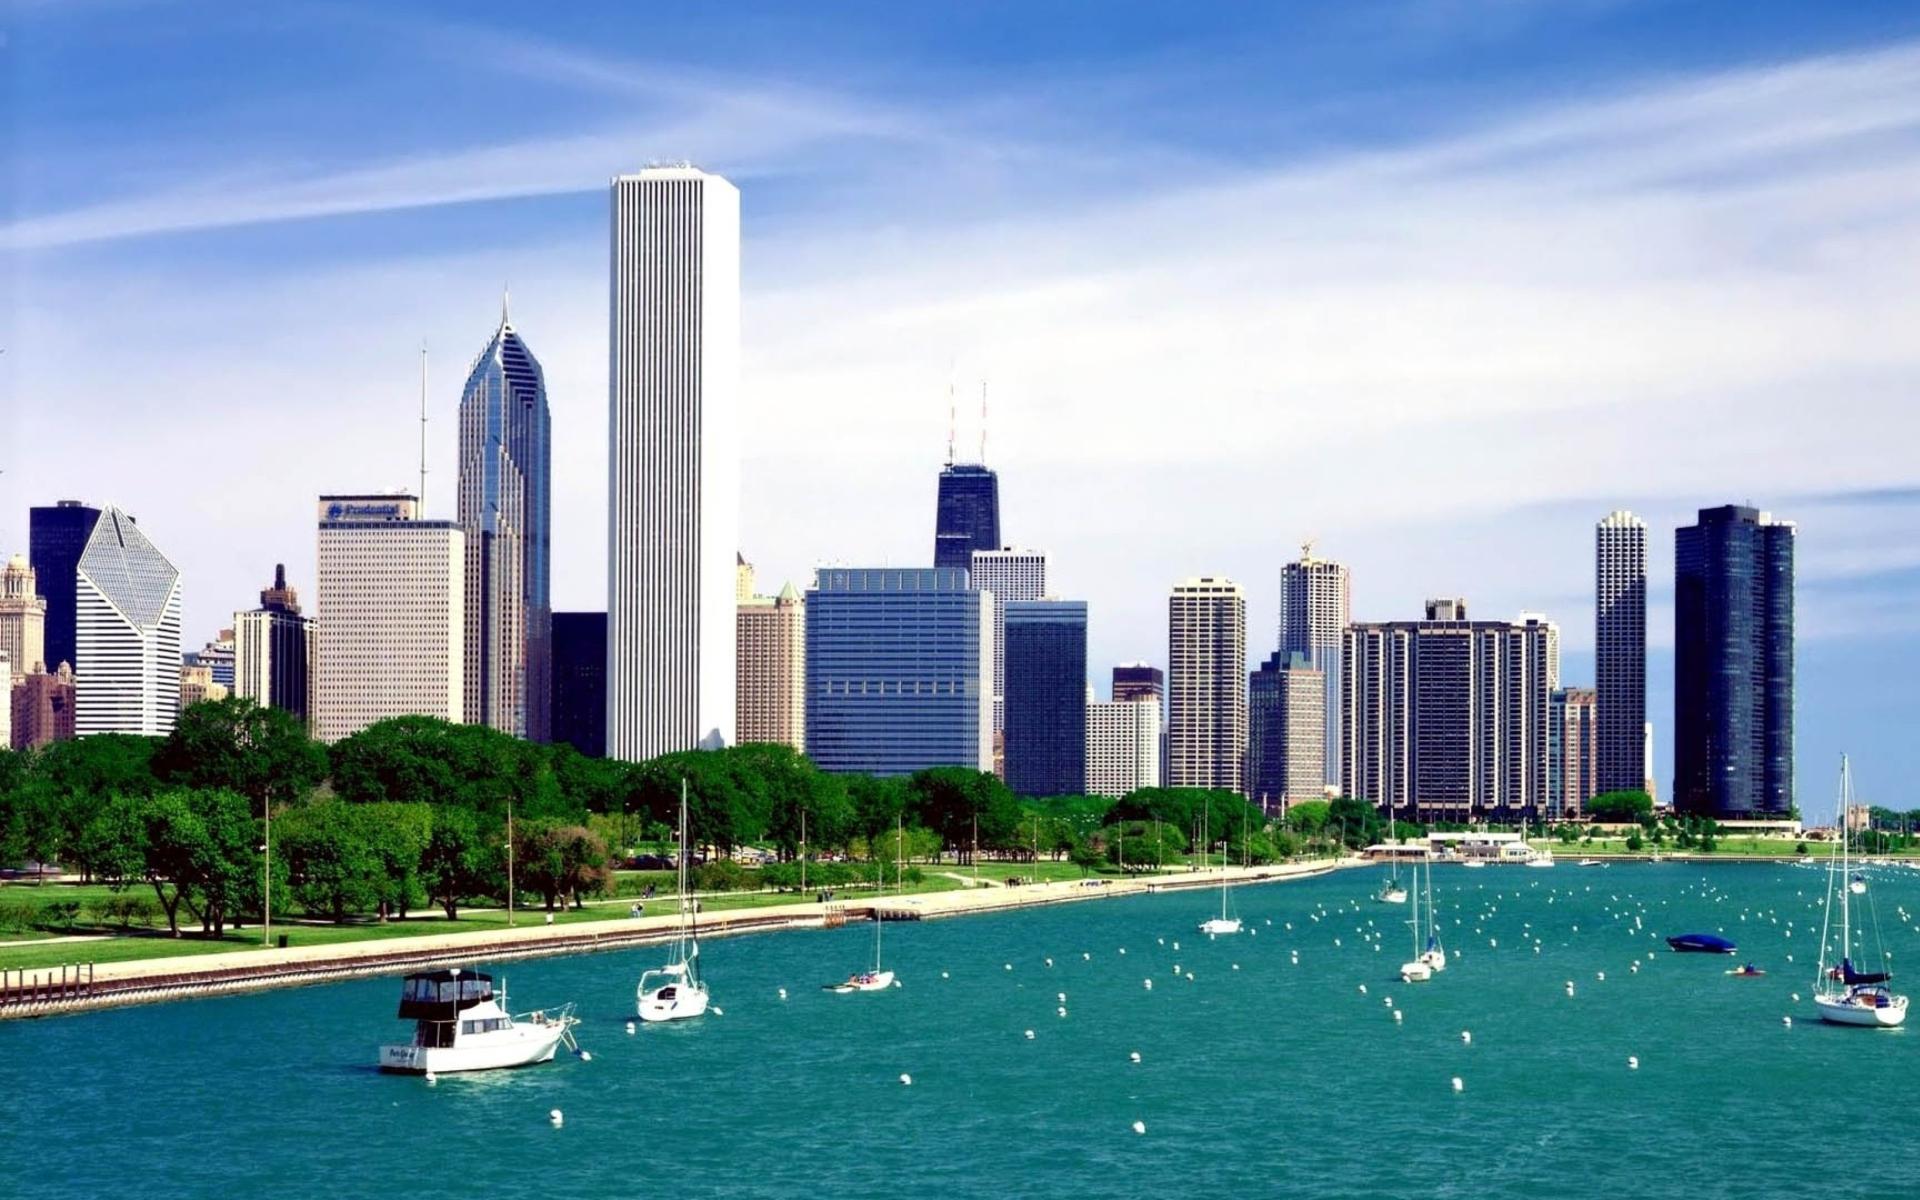 Michigan Lake Chicago para Widescreen Desktop PC 1920x1080 Full HD